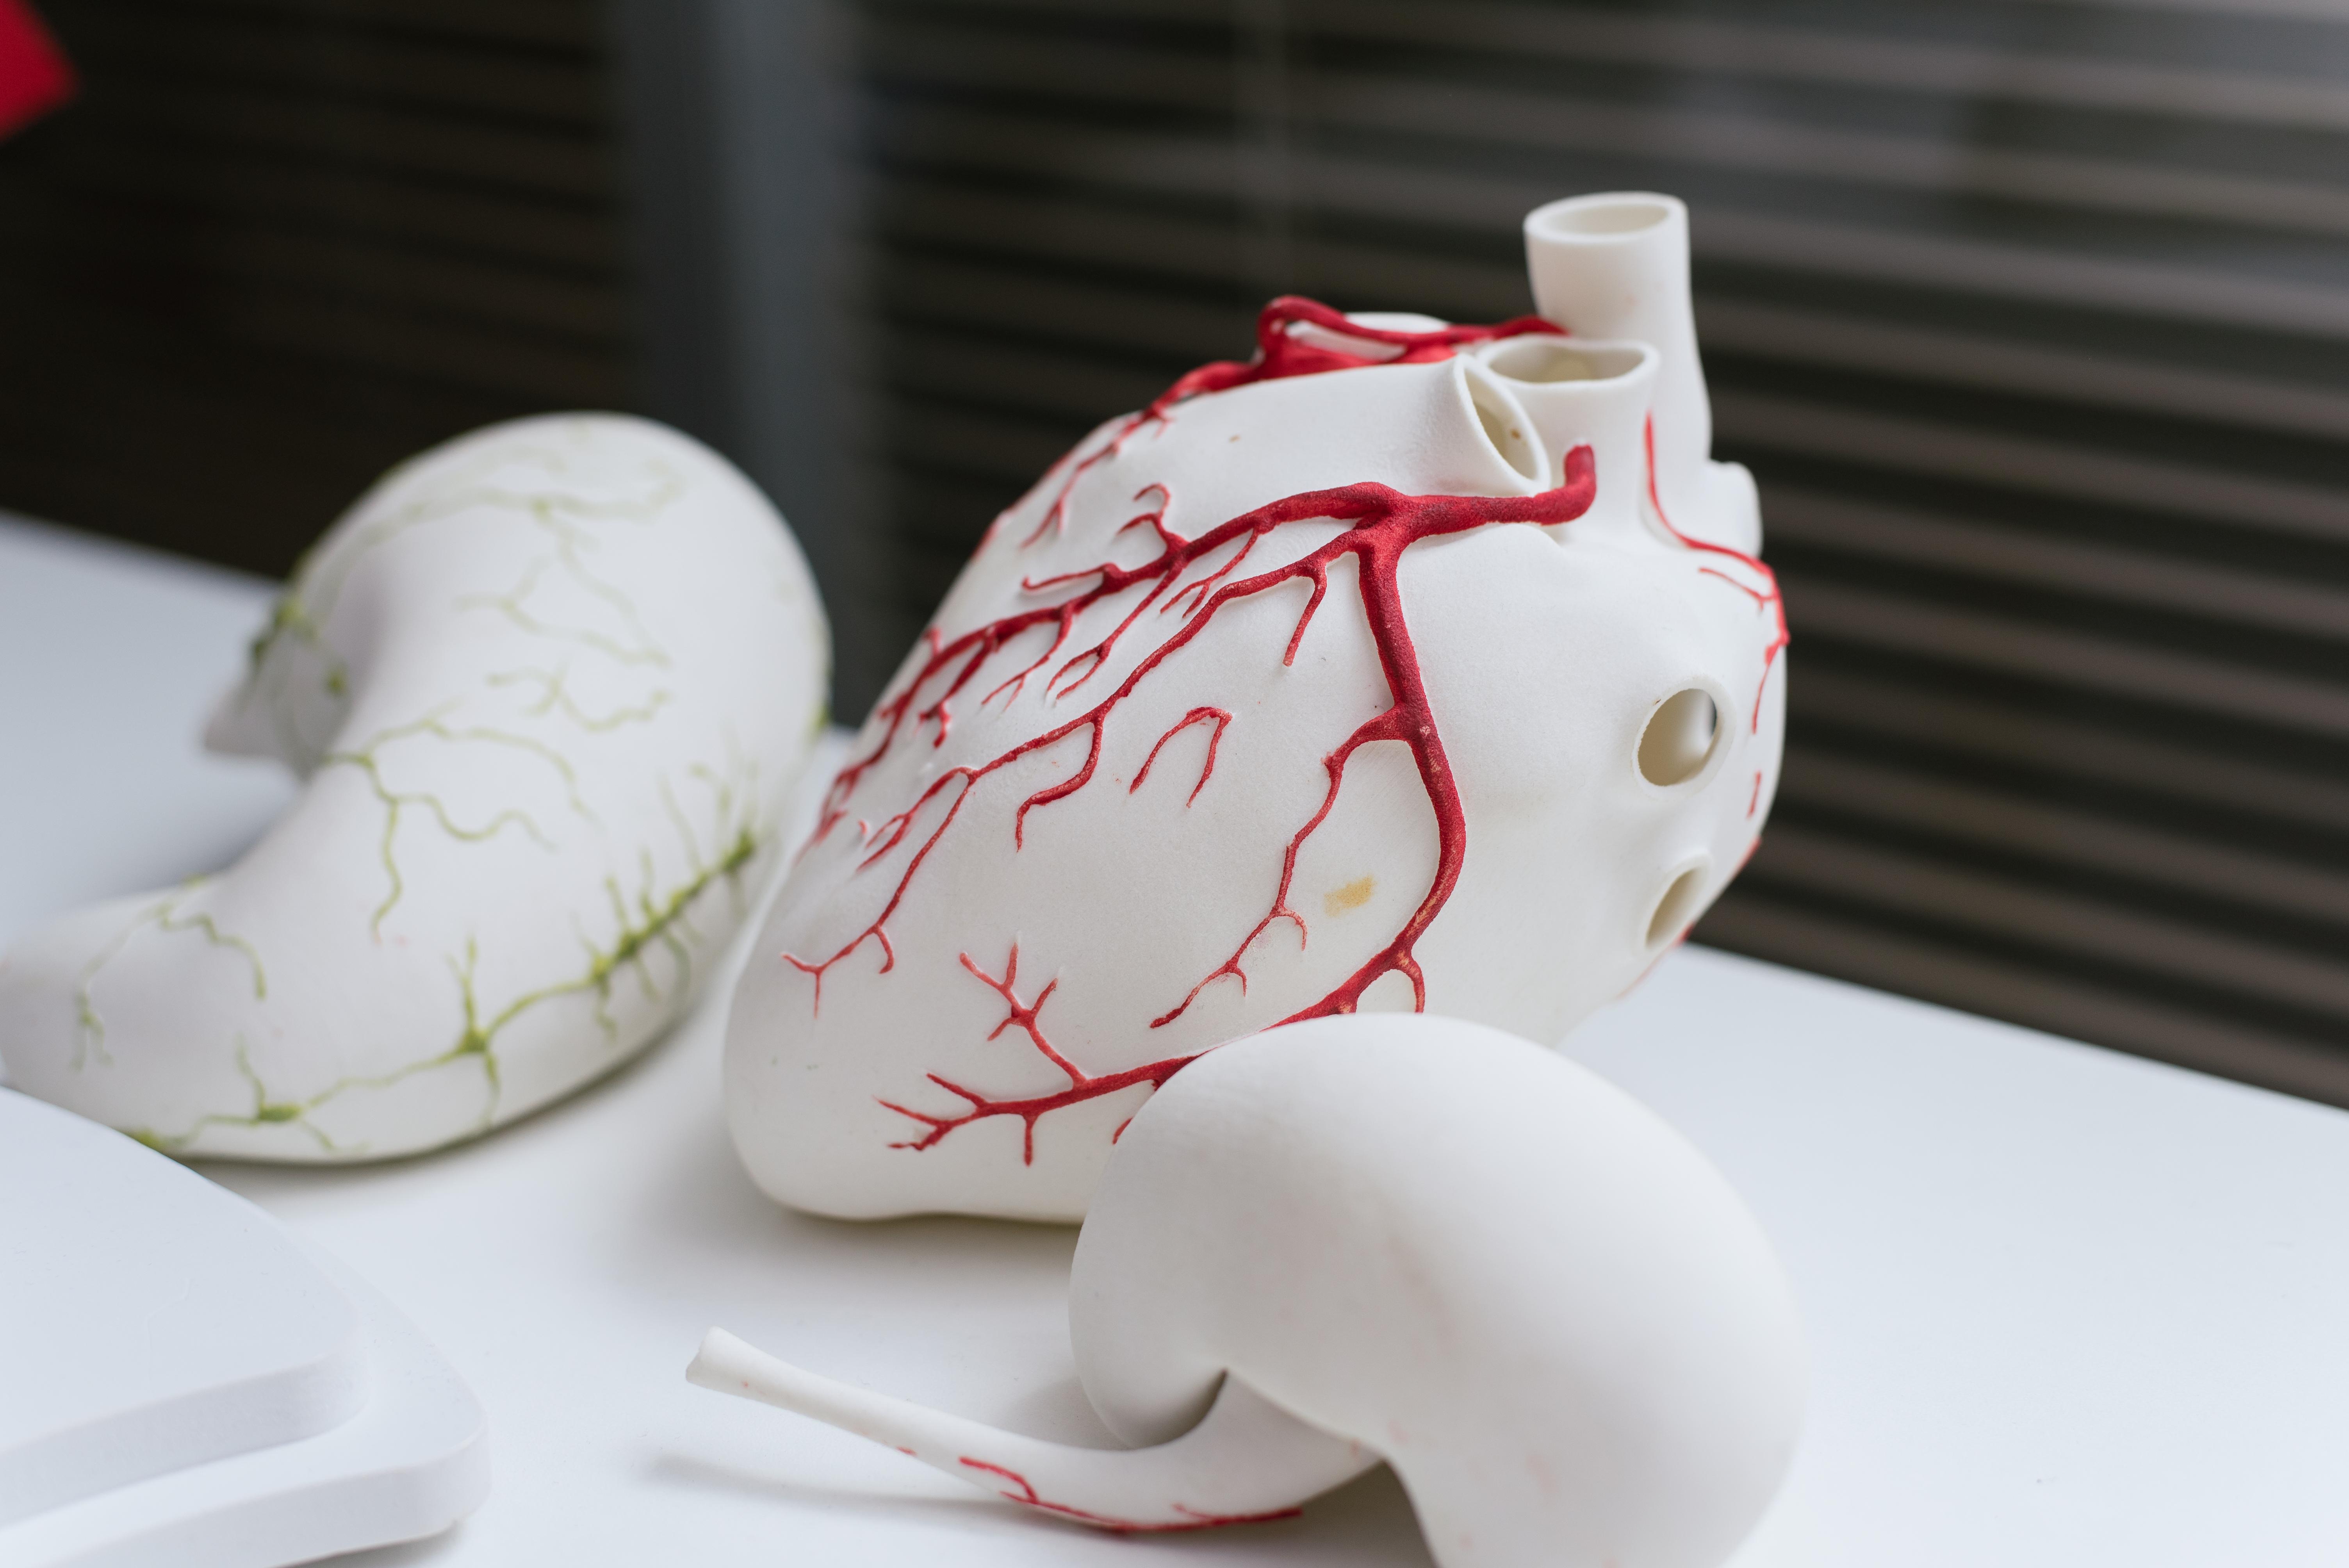 3d-models-organs-printed-3d-printer-heart